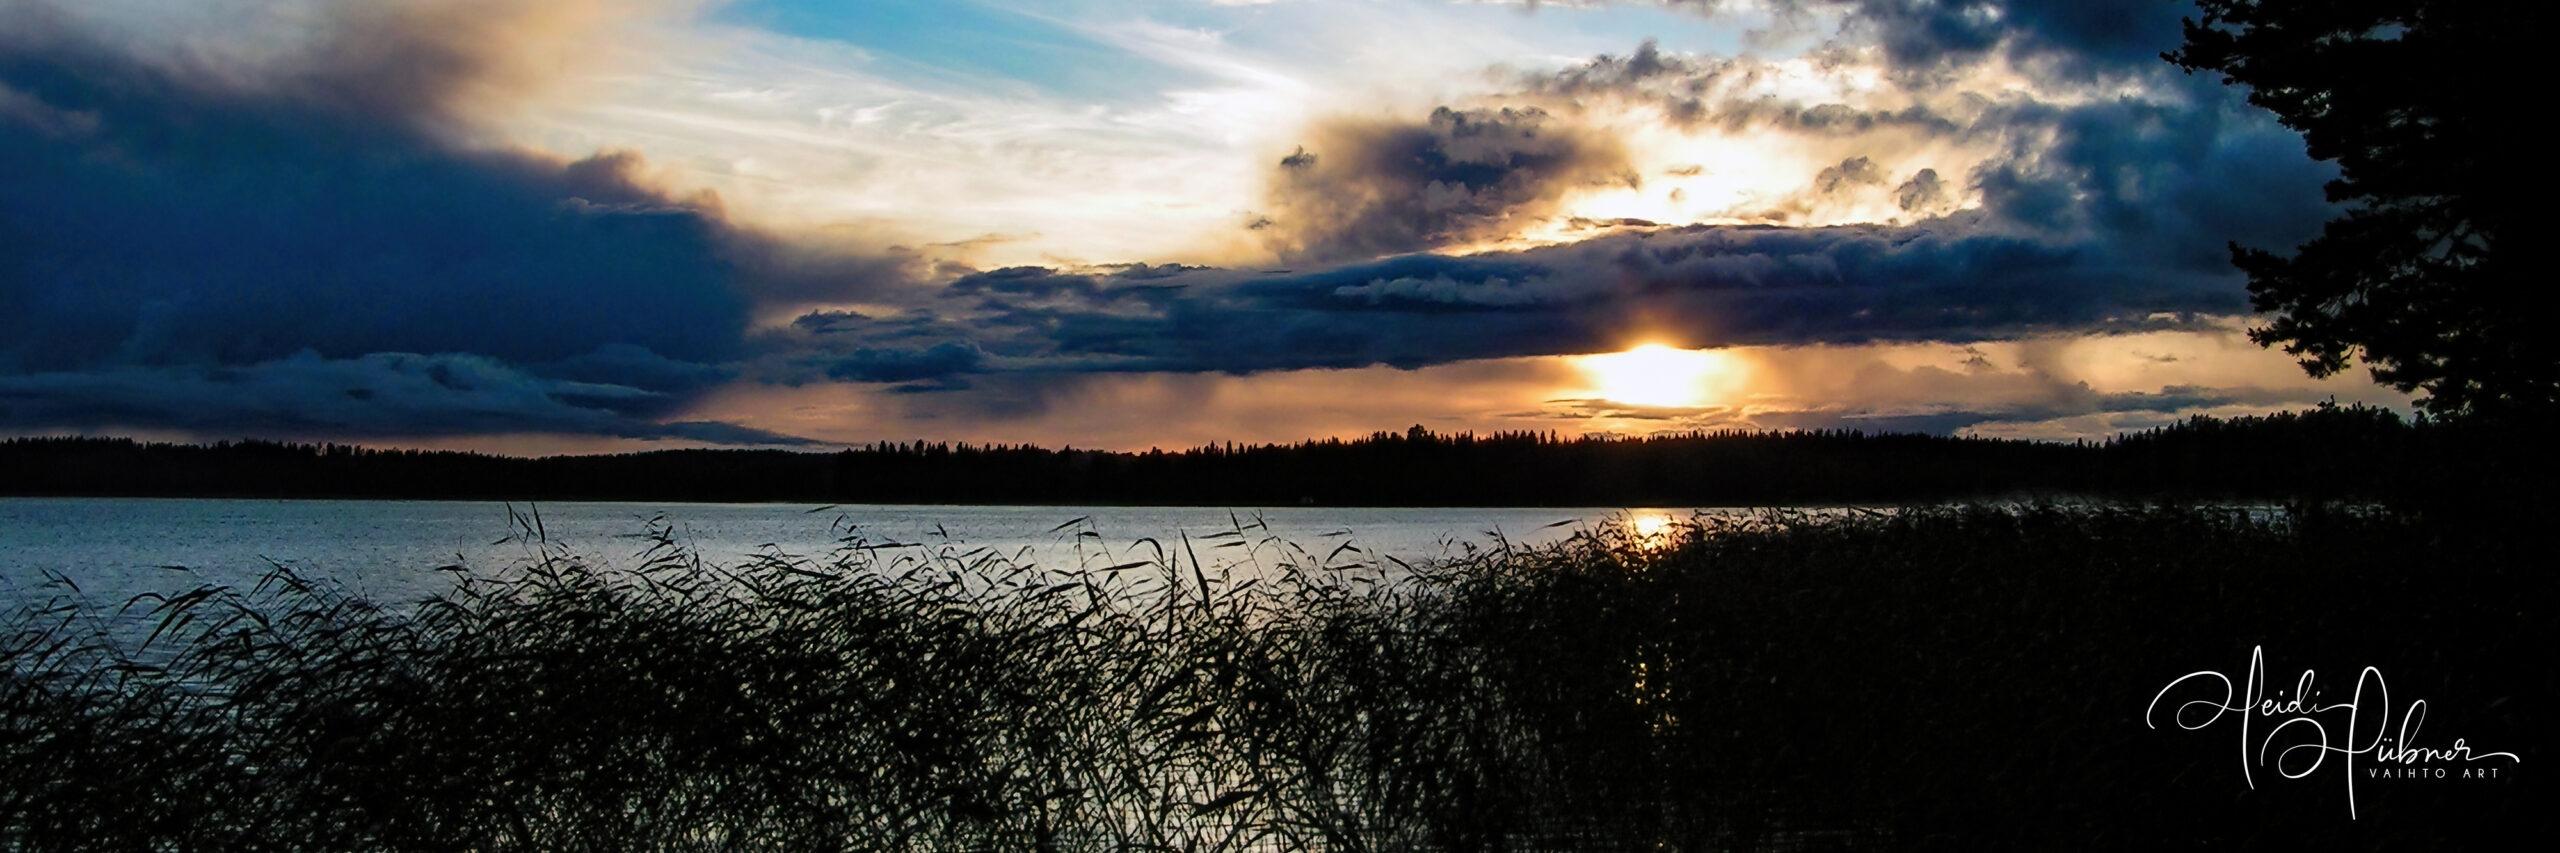 Blue Evening muuttosaaret finland huebner photography heidi huebner vaihto art